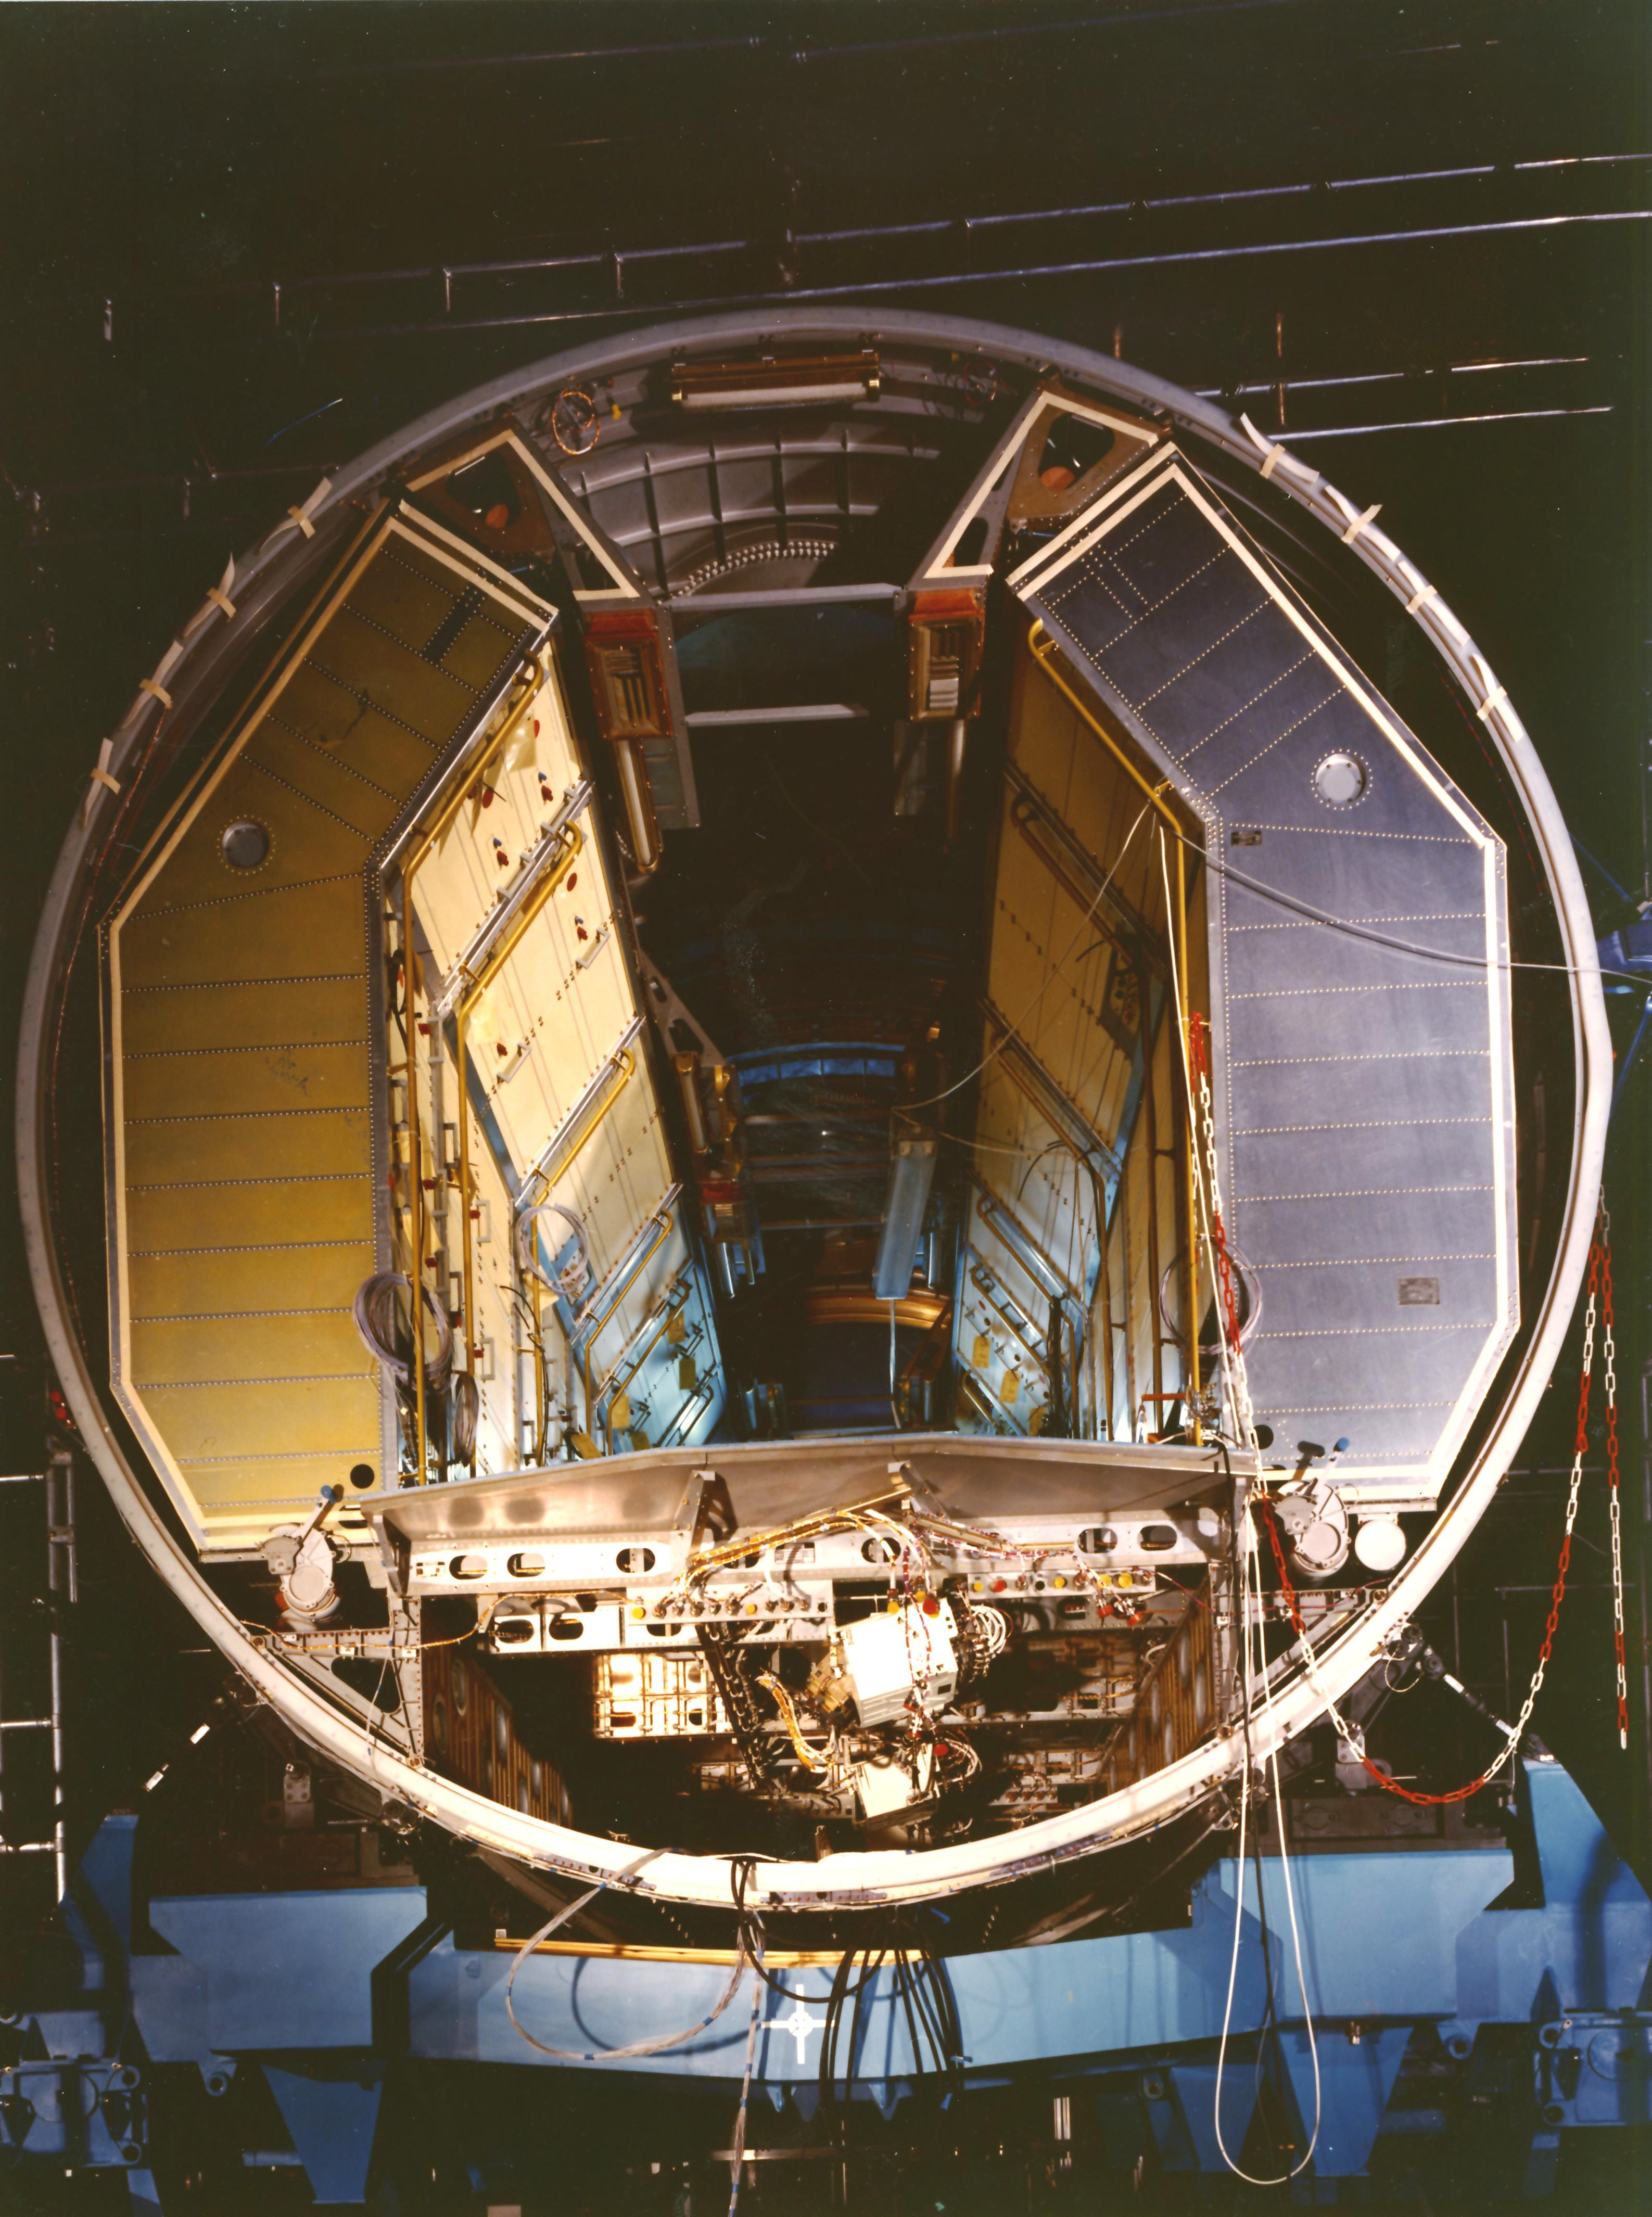 space in images 2013 11 spacelab module engineering model bremen 1978. Black Bedroom Furniture Sets. Home Design Ideas